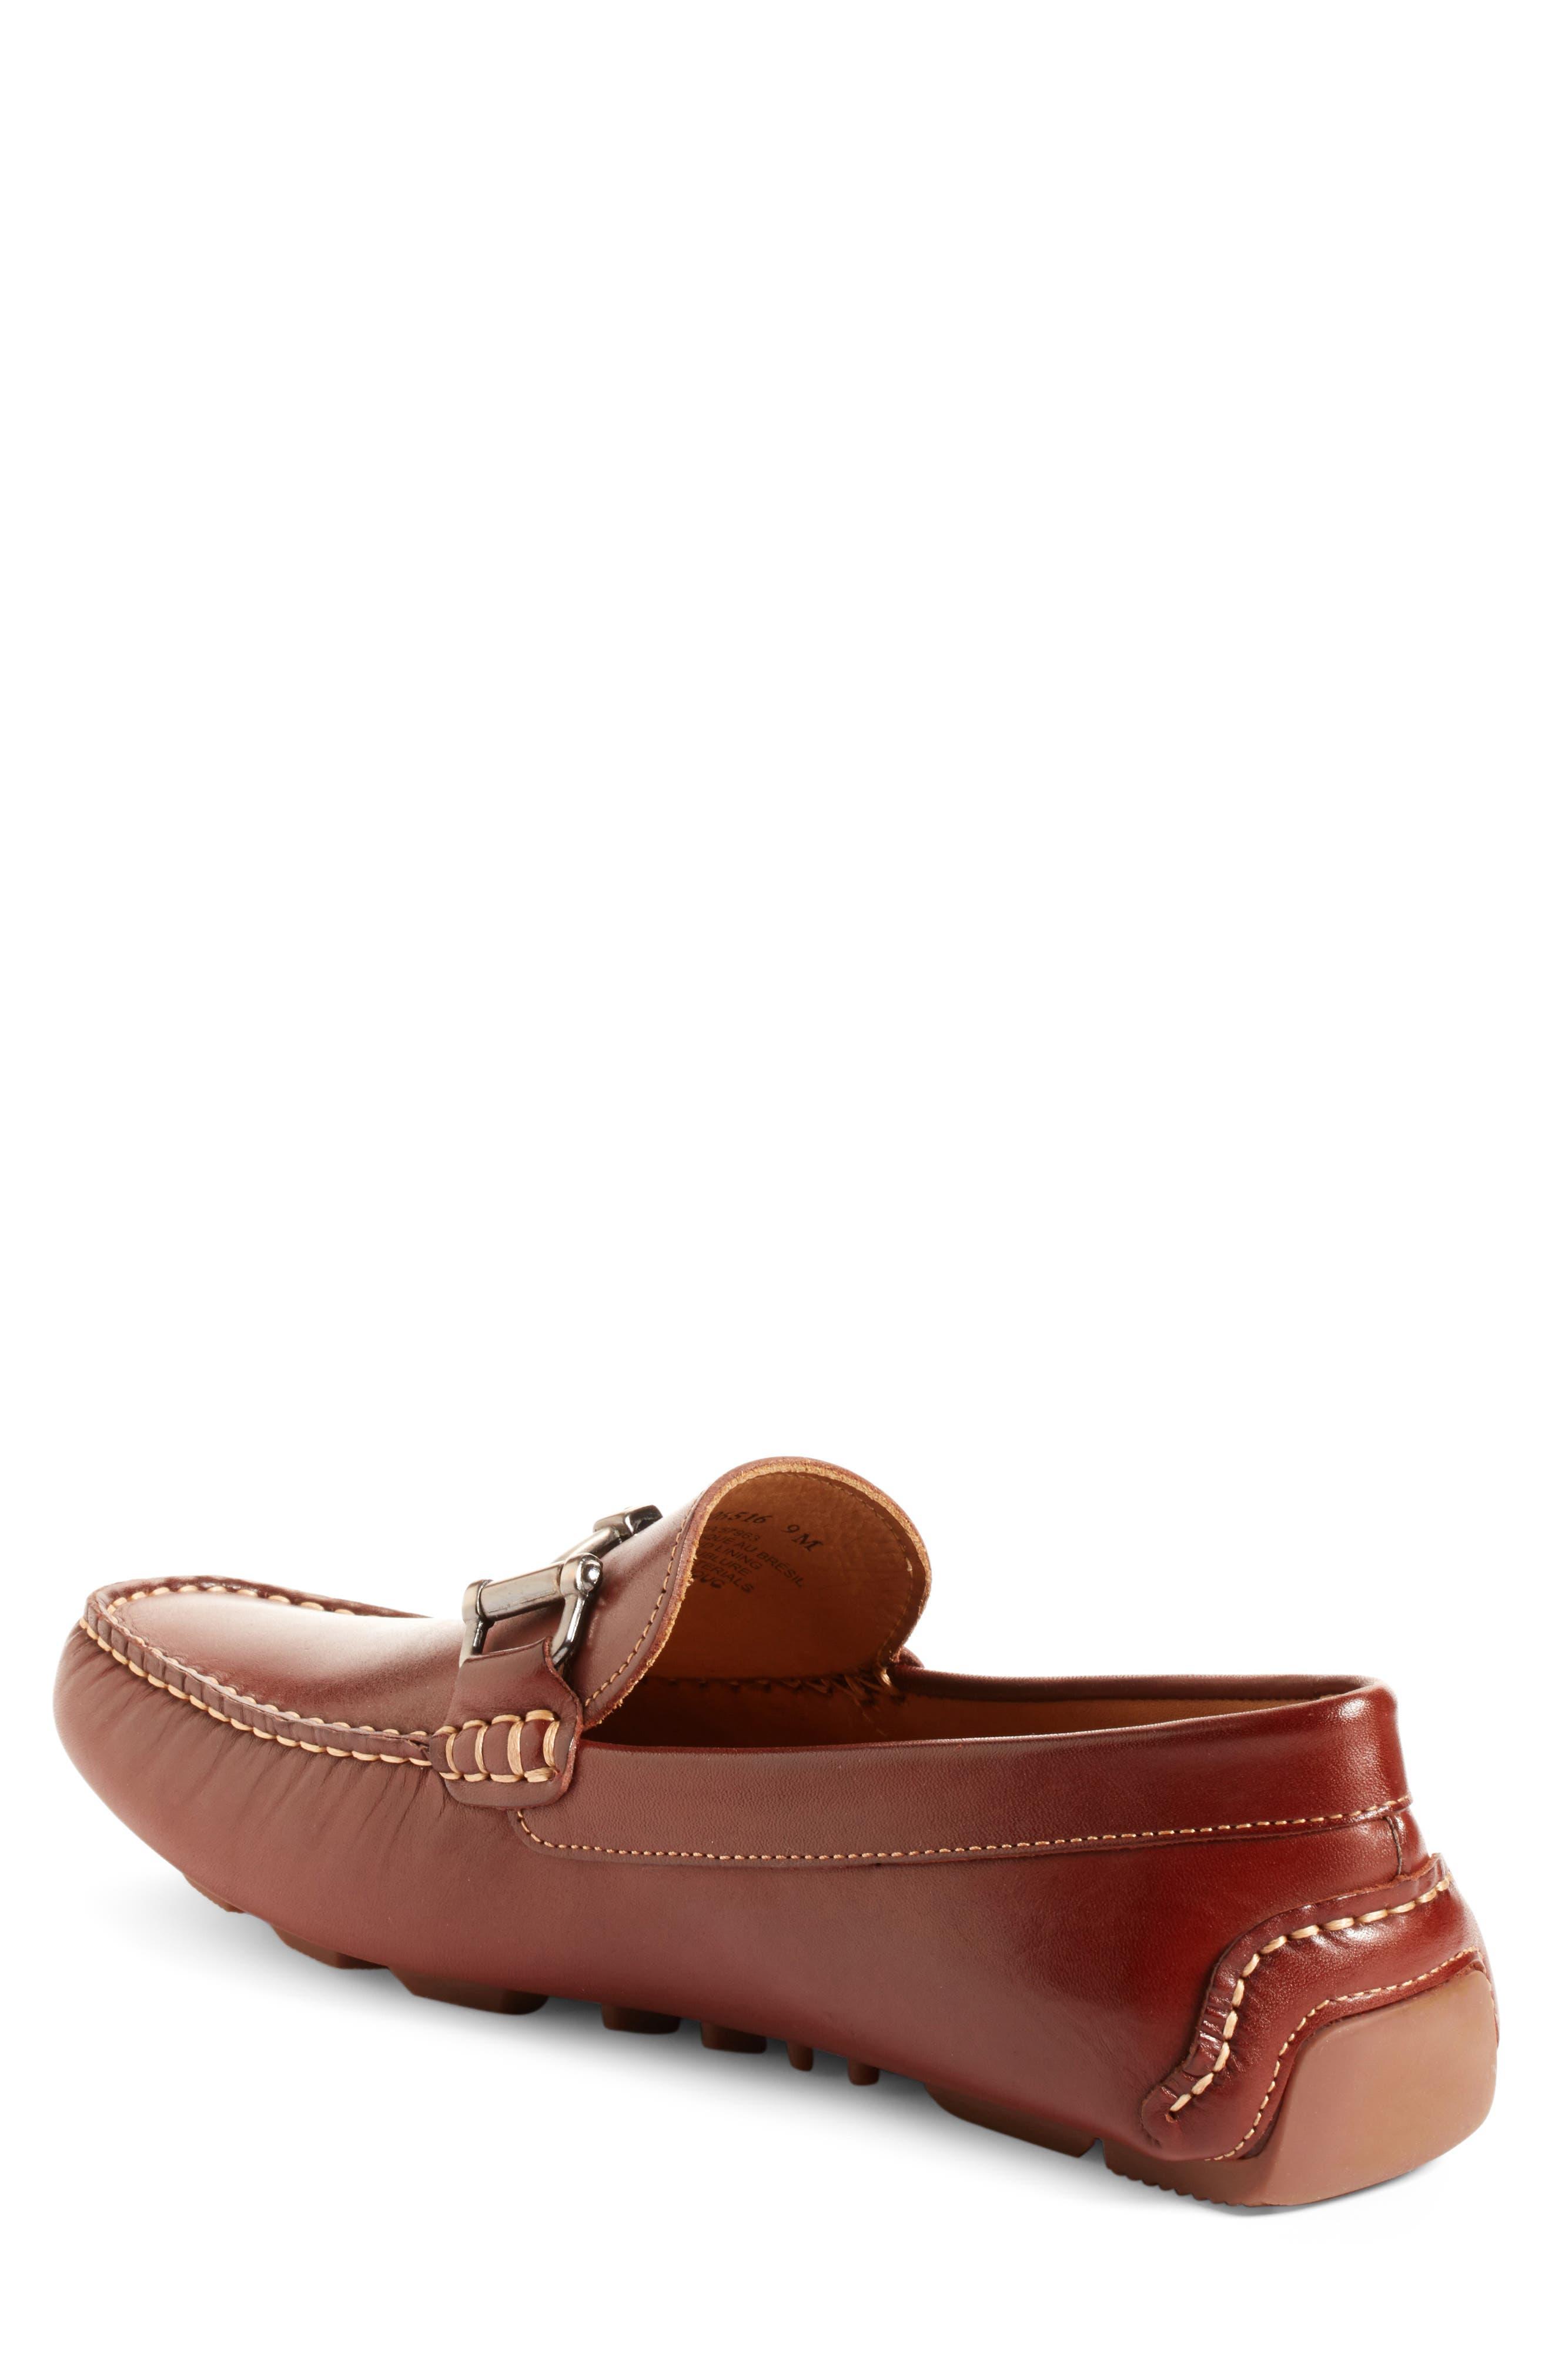 73ad9a25e Men's 1901 Shoes | Nordstrom